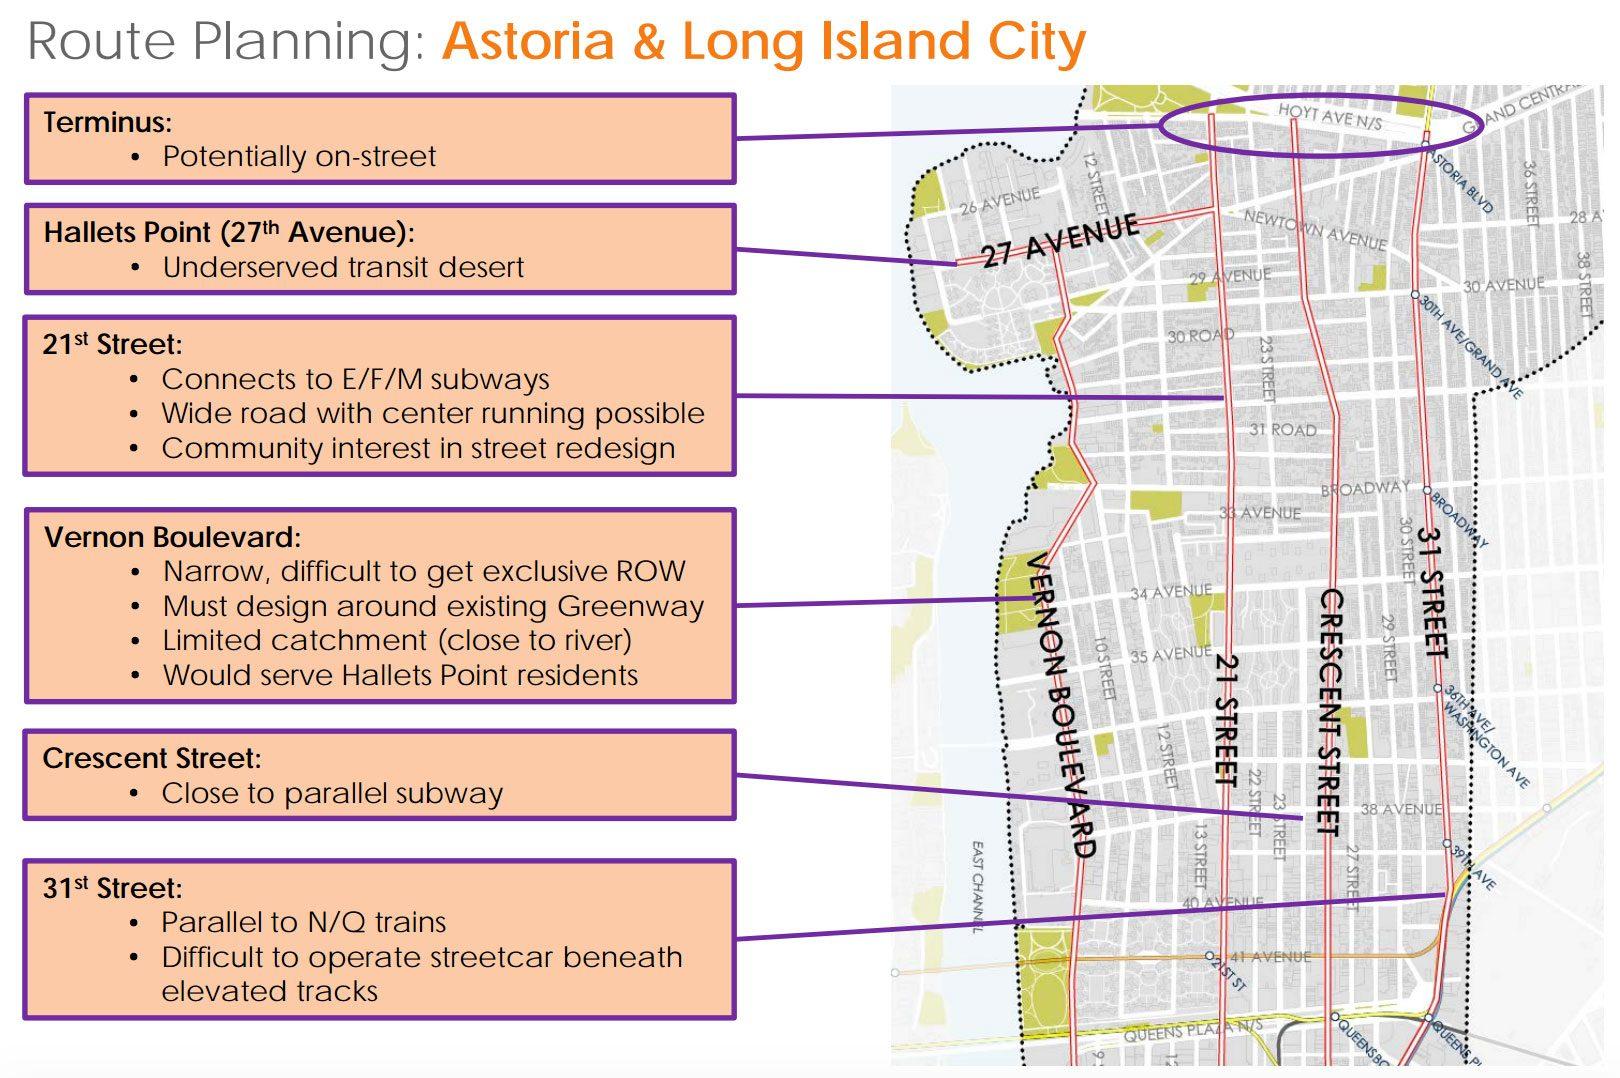 bqx-streetcar-route-astoria-and-long-island-city-2